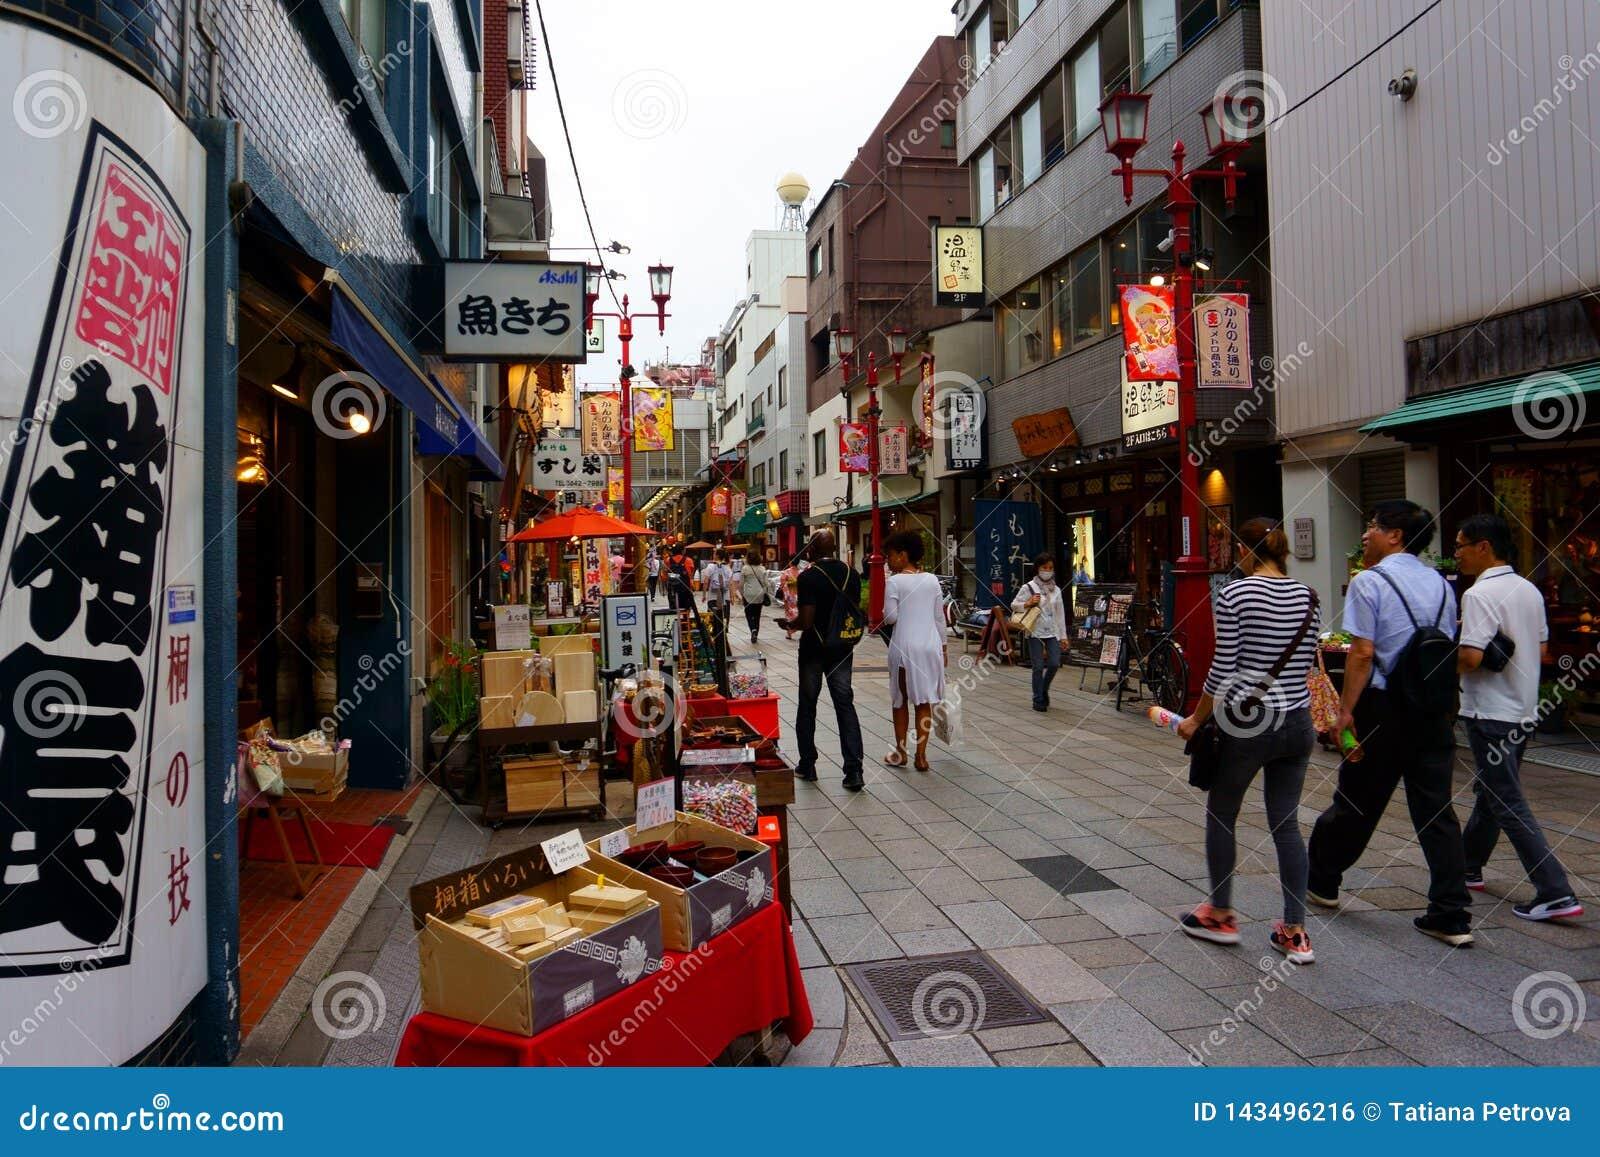 Kannon dori shopping market street. Dining and souvenir buying in Asakusa